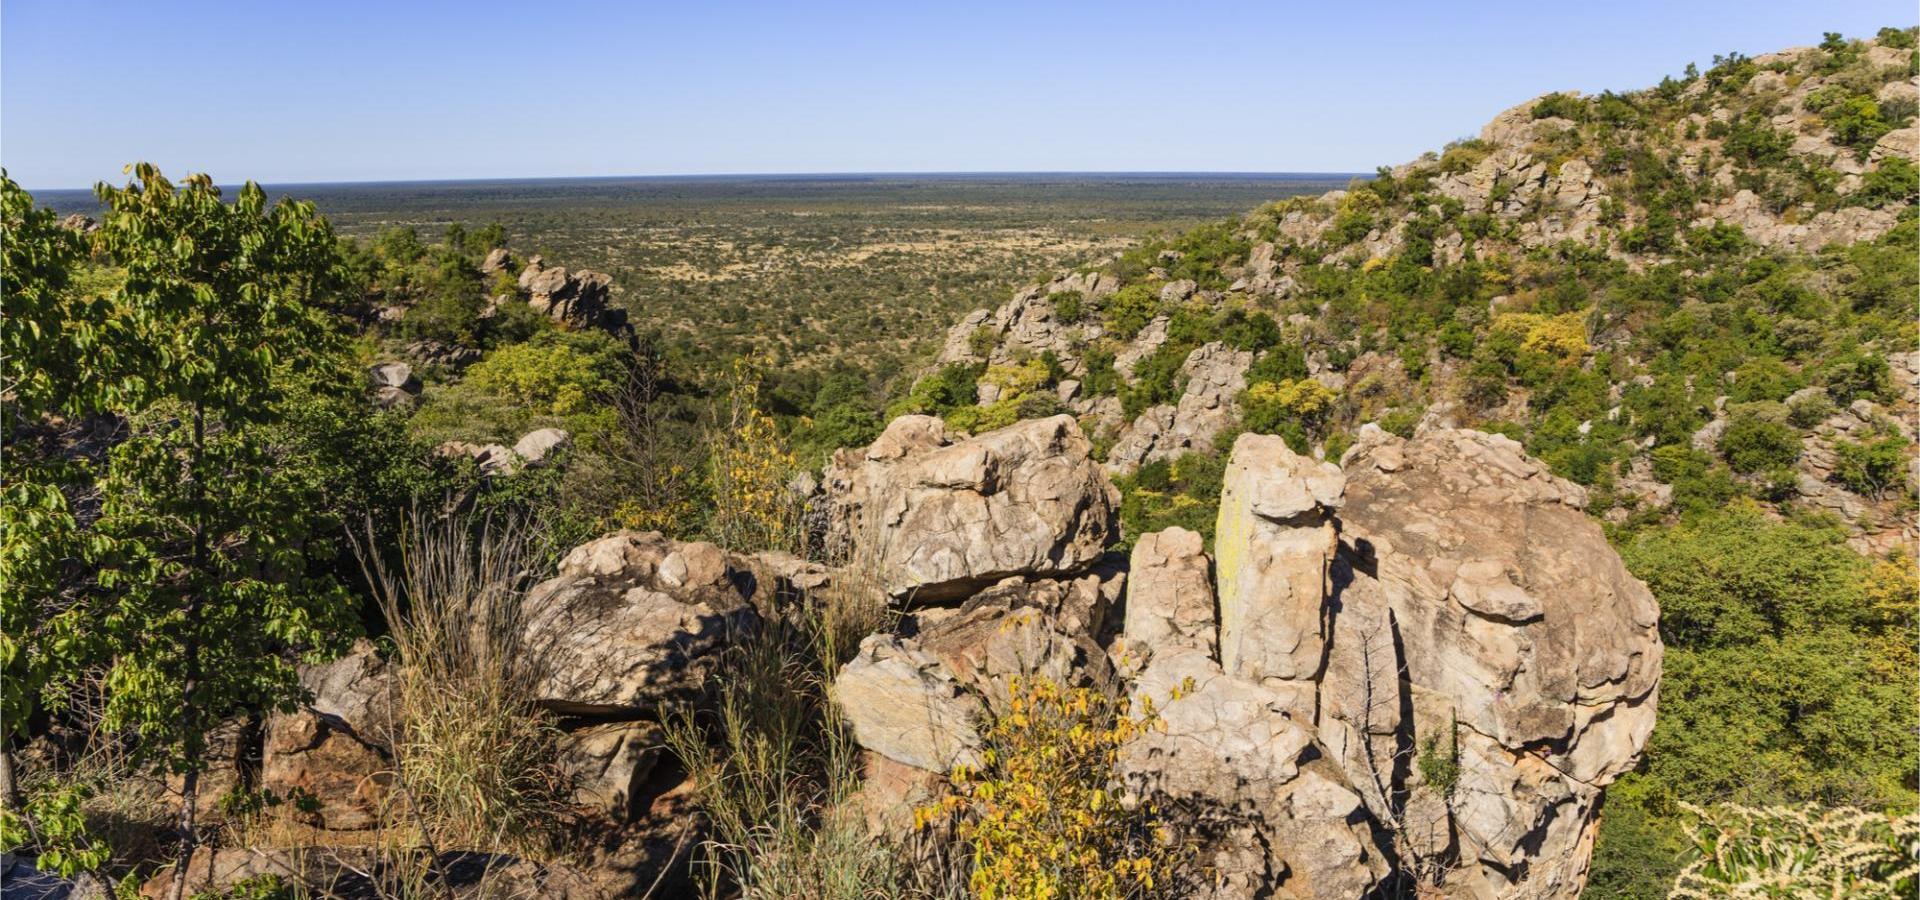 Panorama der Tsodilo Hills, Weltkulturerbe der UNESCO in Botswana